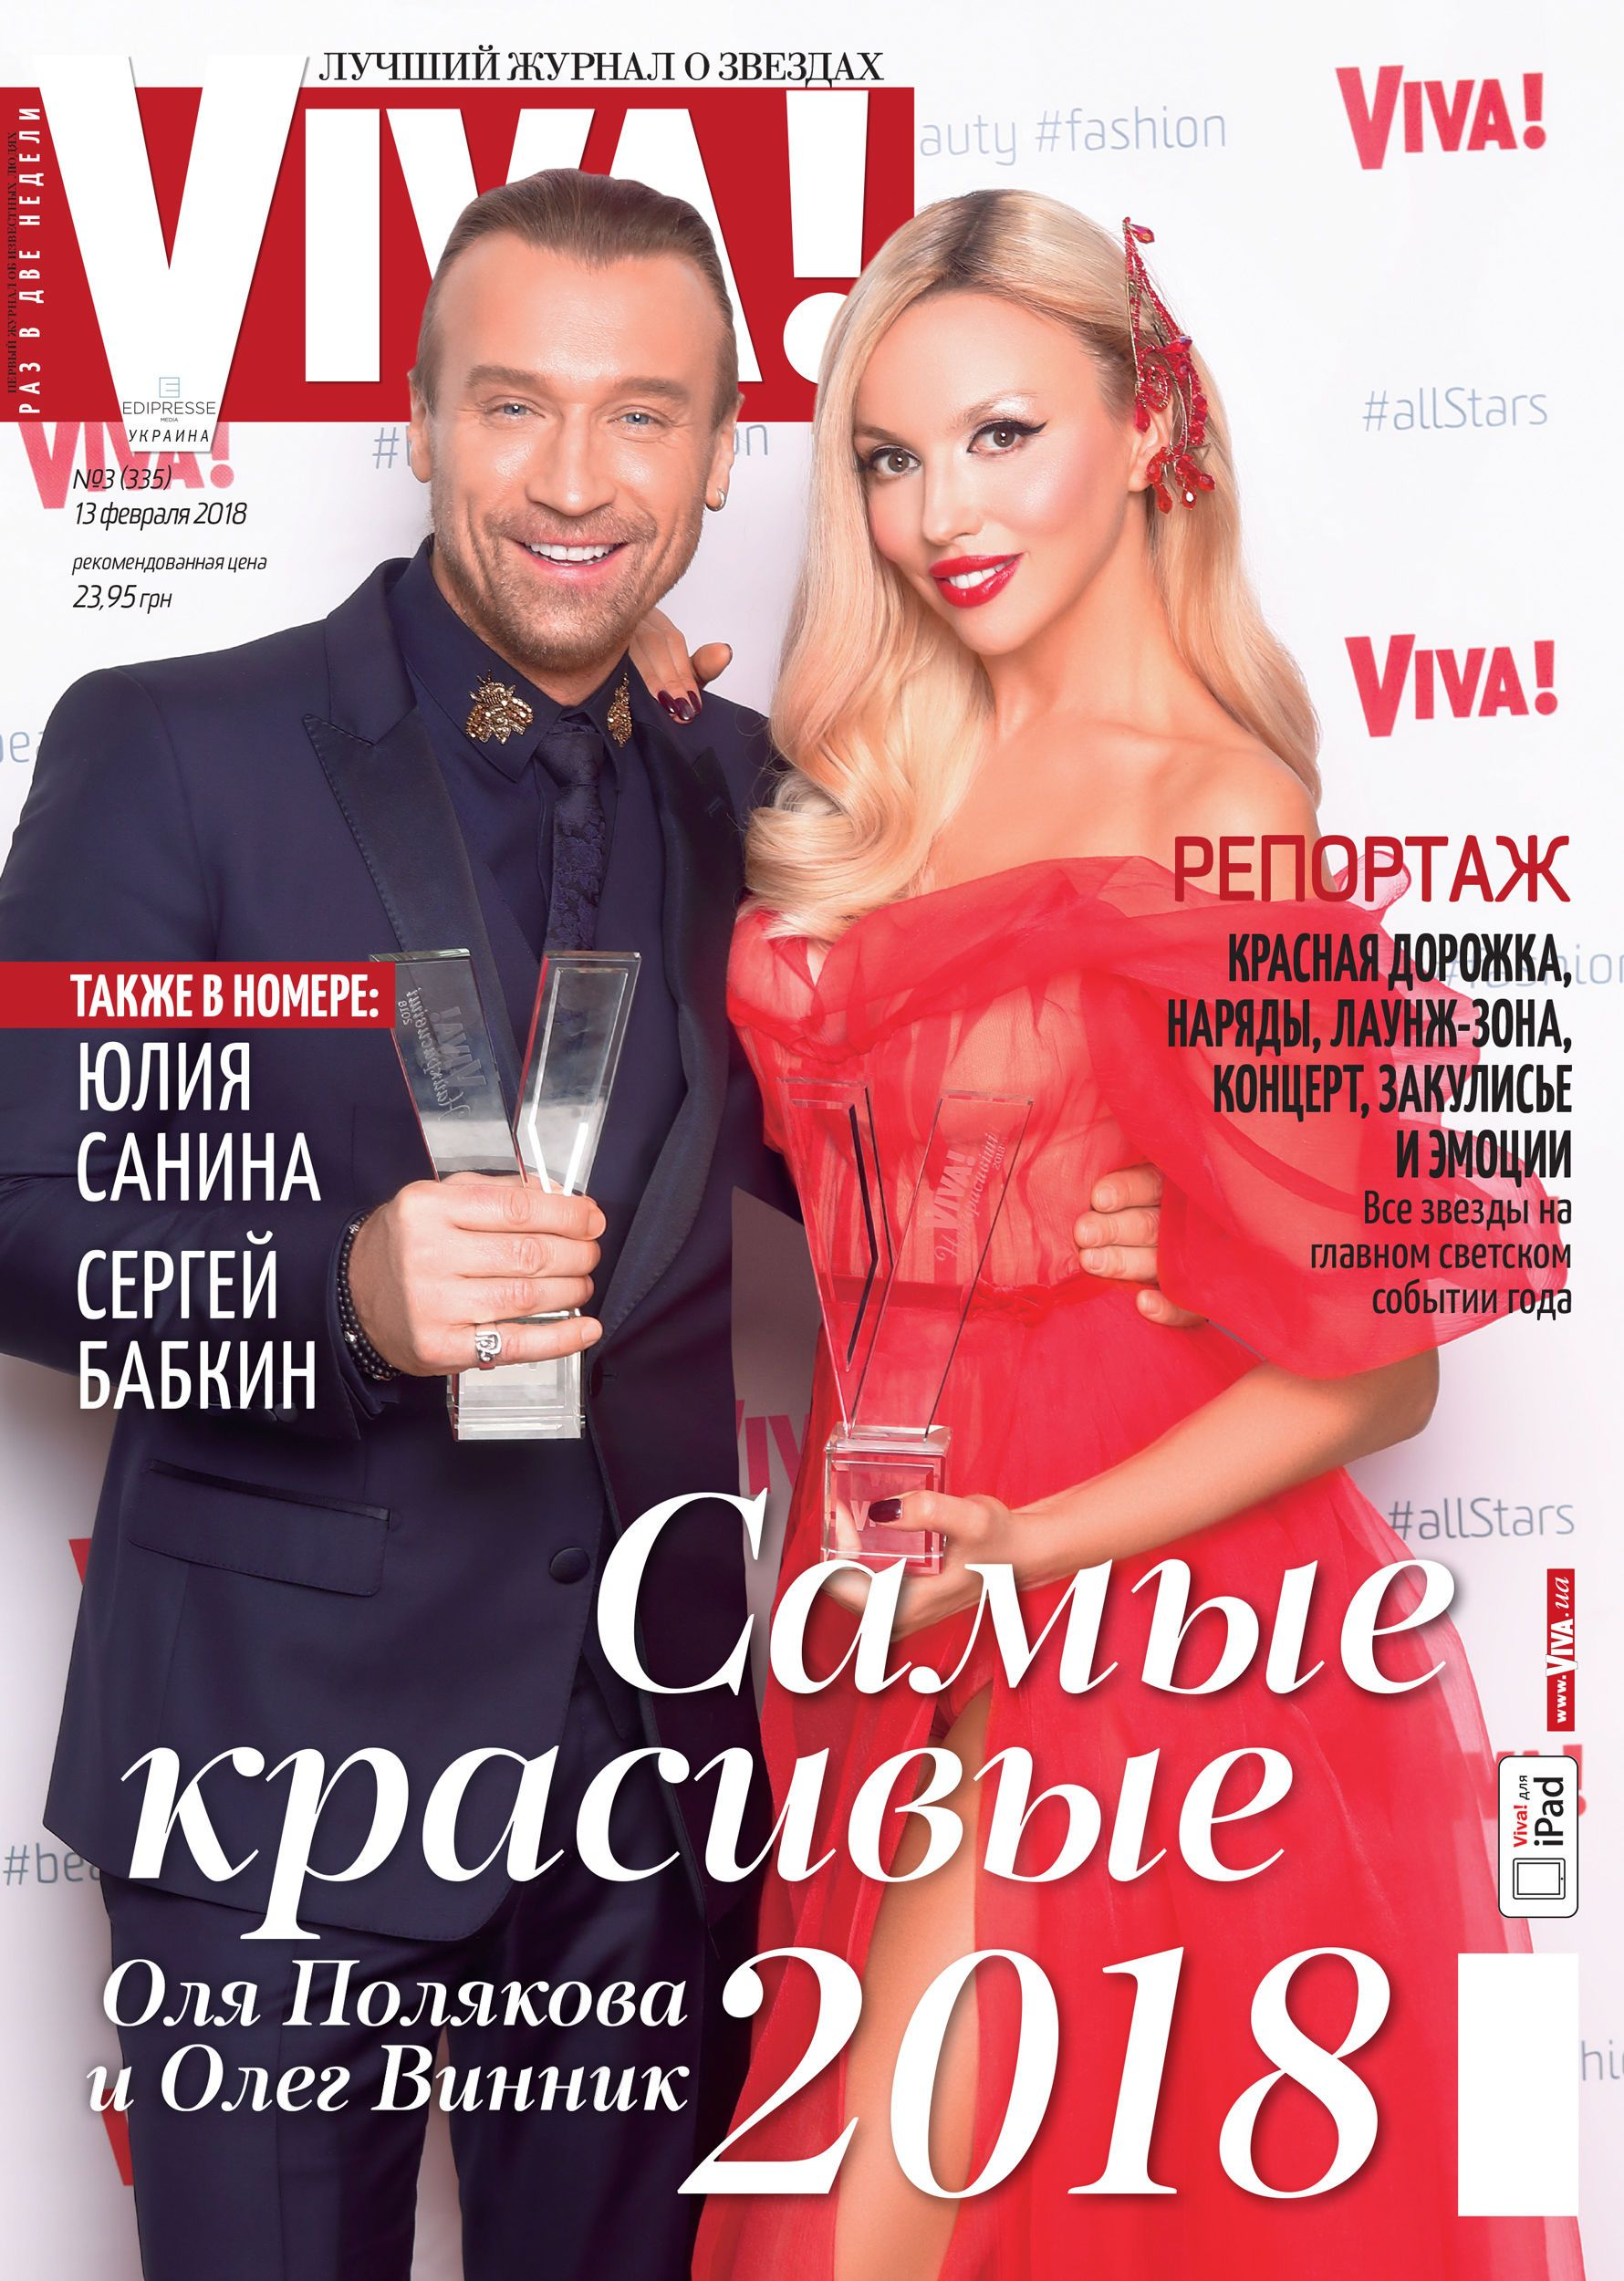 Оля Полякова та Олег Винник для Viva_1